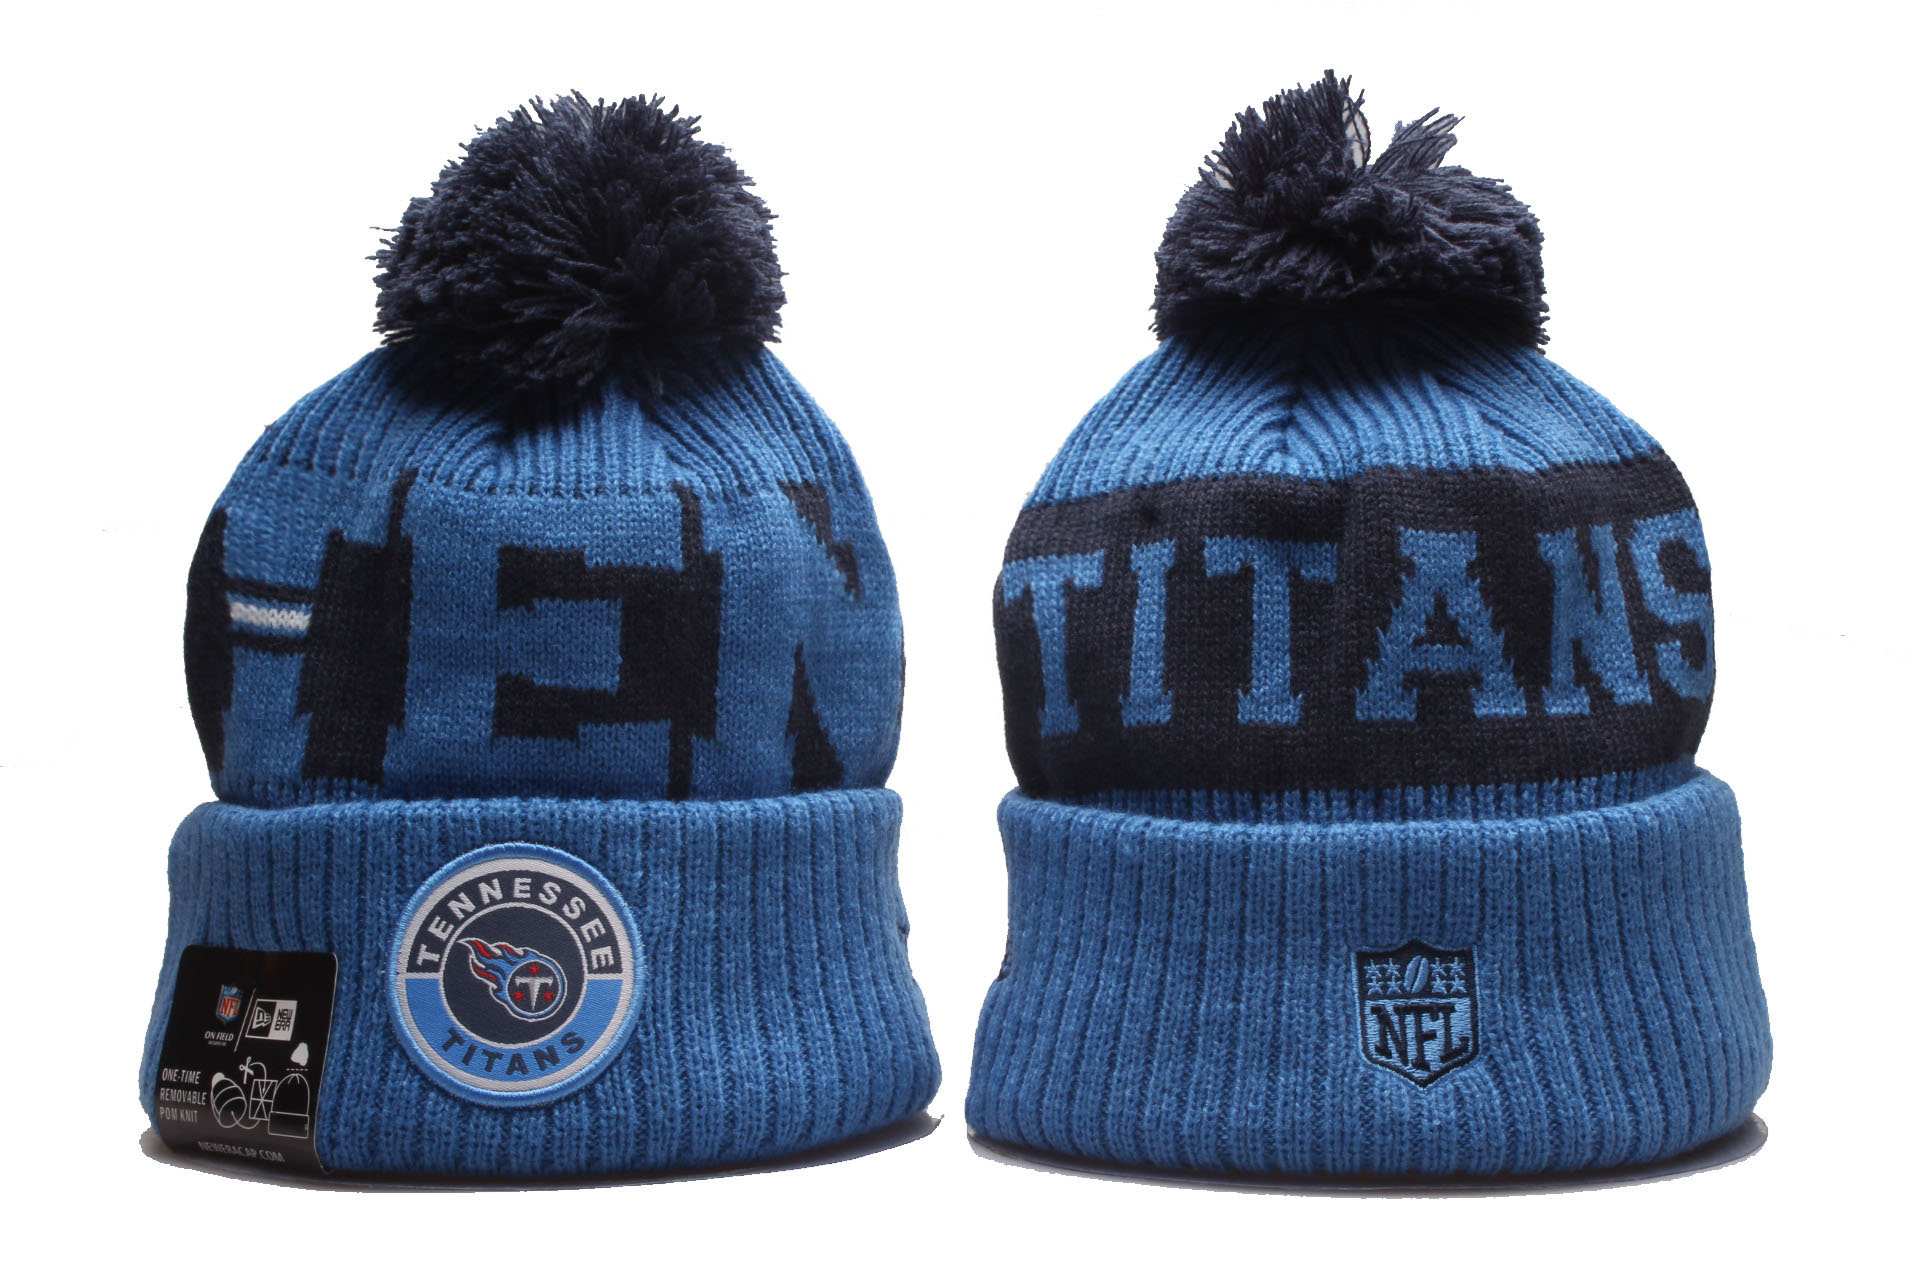 Titans Team Logo Blue 2020 NFL Sideline Pom Cuffed Knit Hat YP